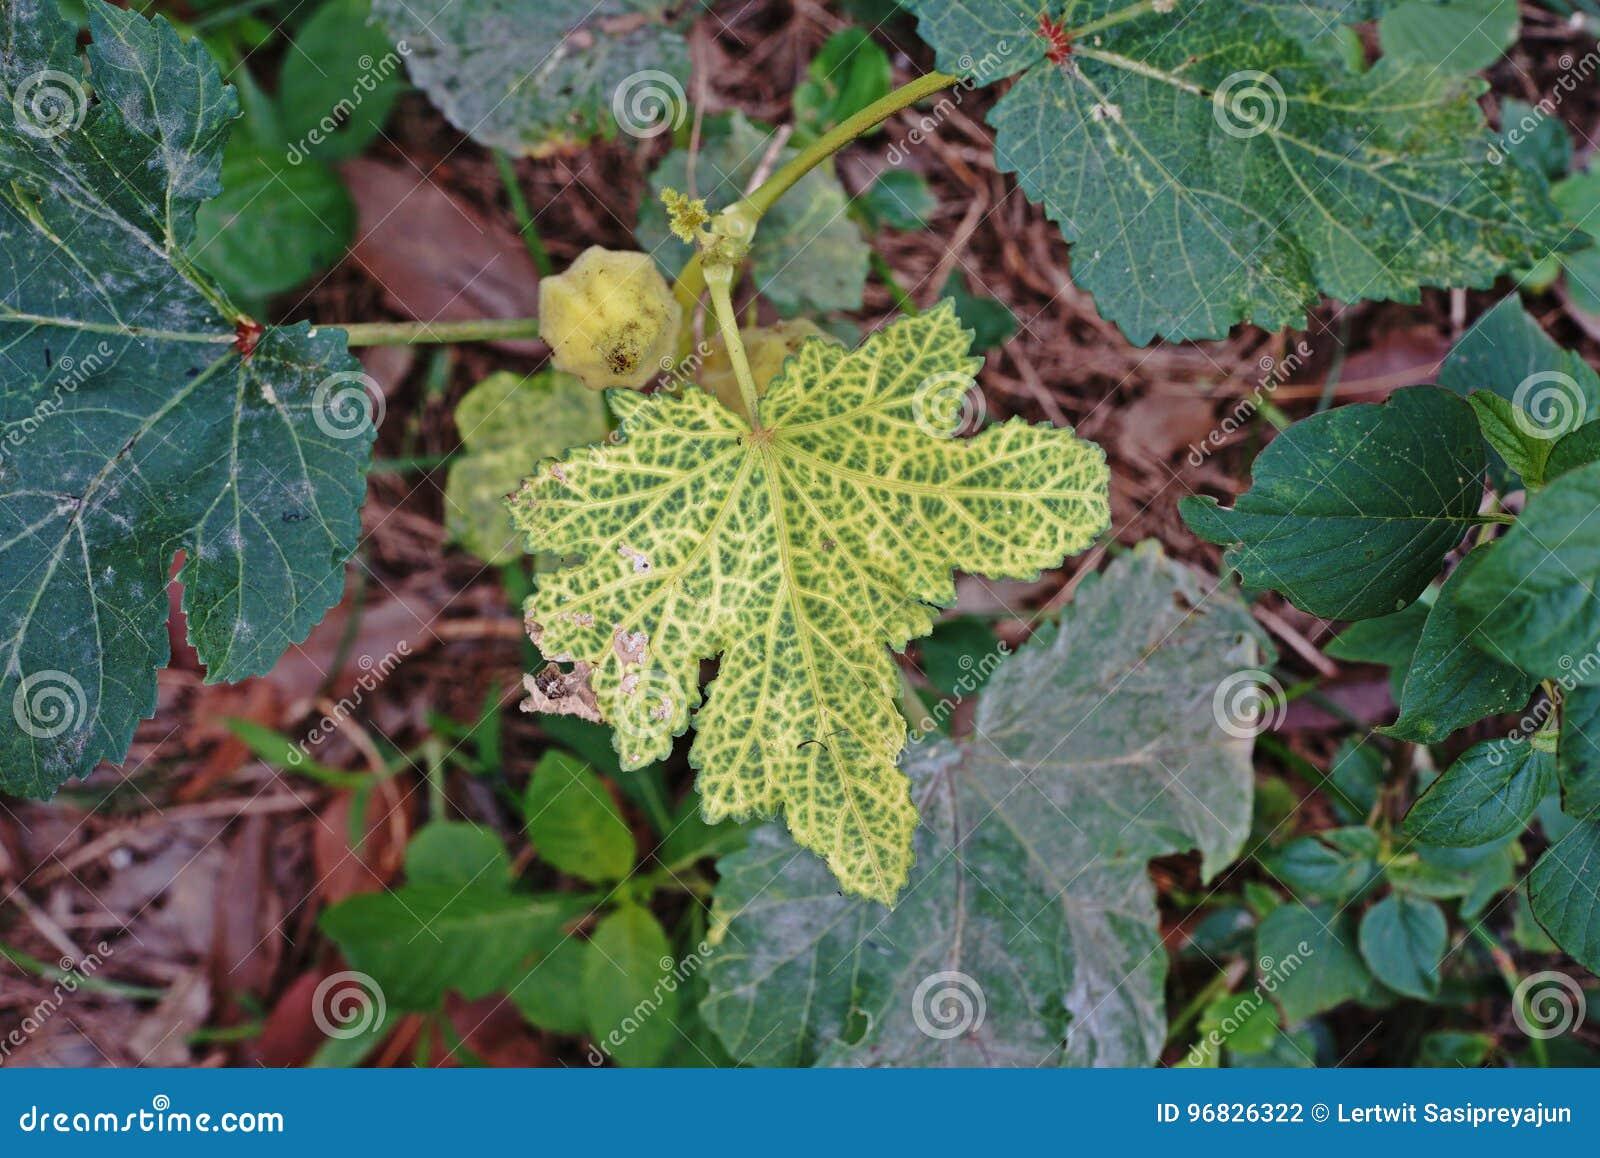 Заболевание лист бамии